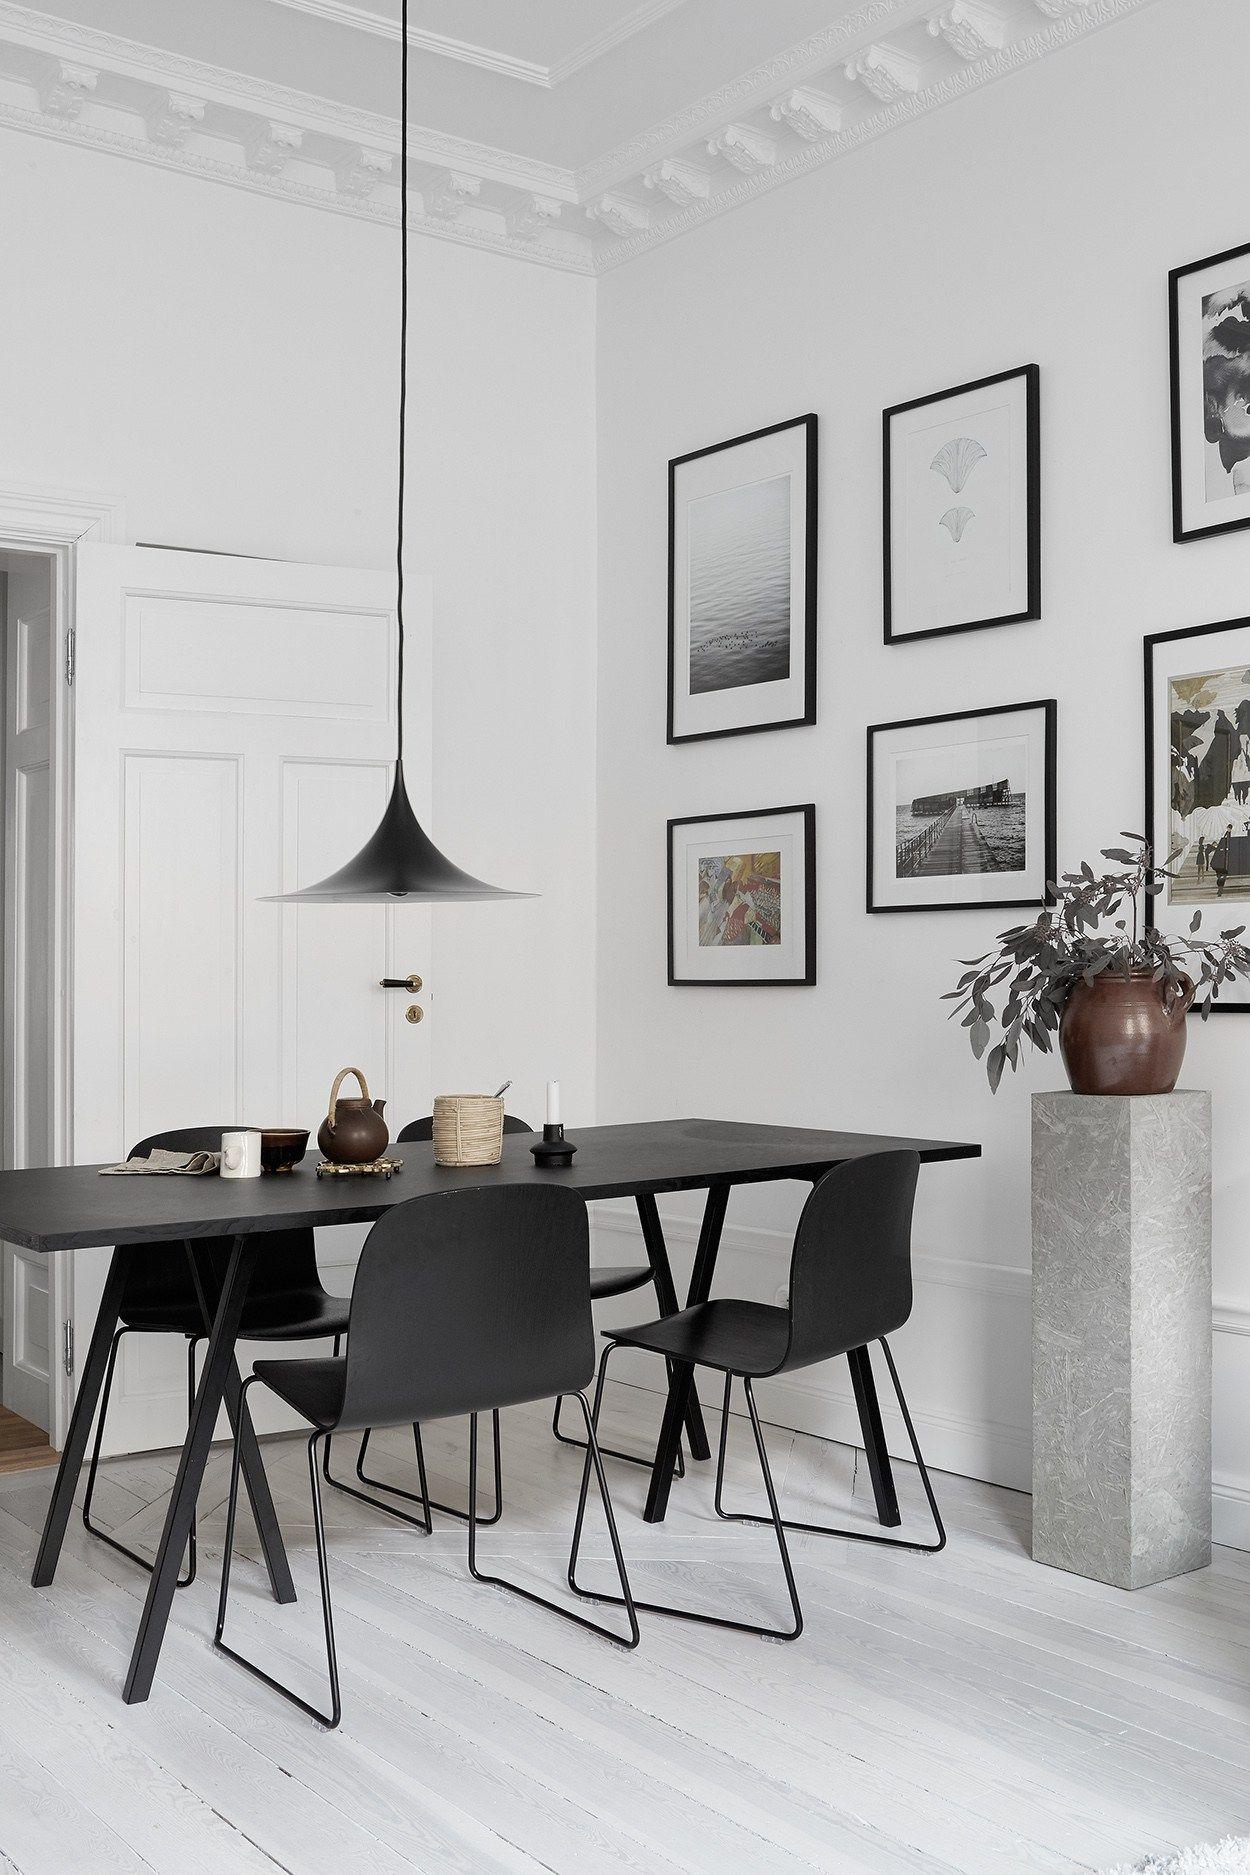 Cozy turn of the century home – COCO LAPINE DESIGN